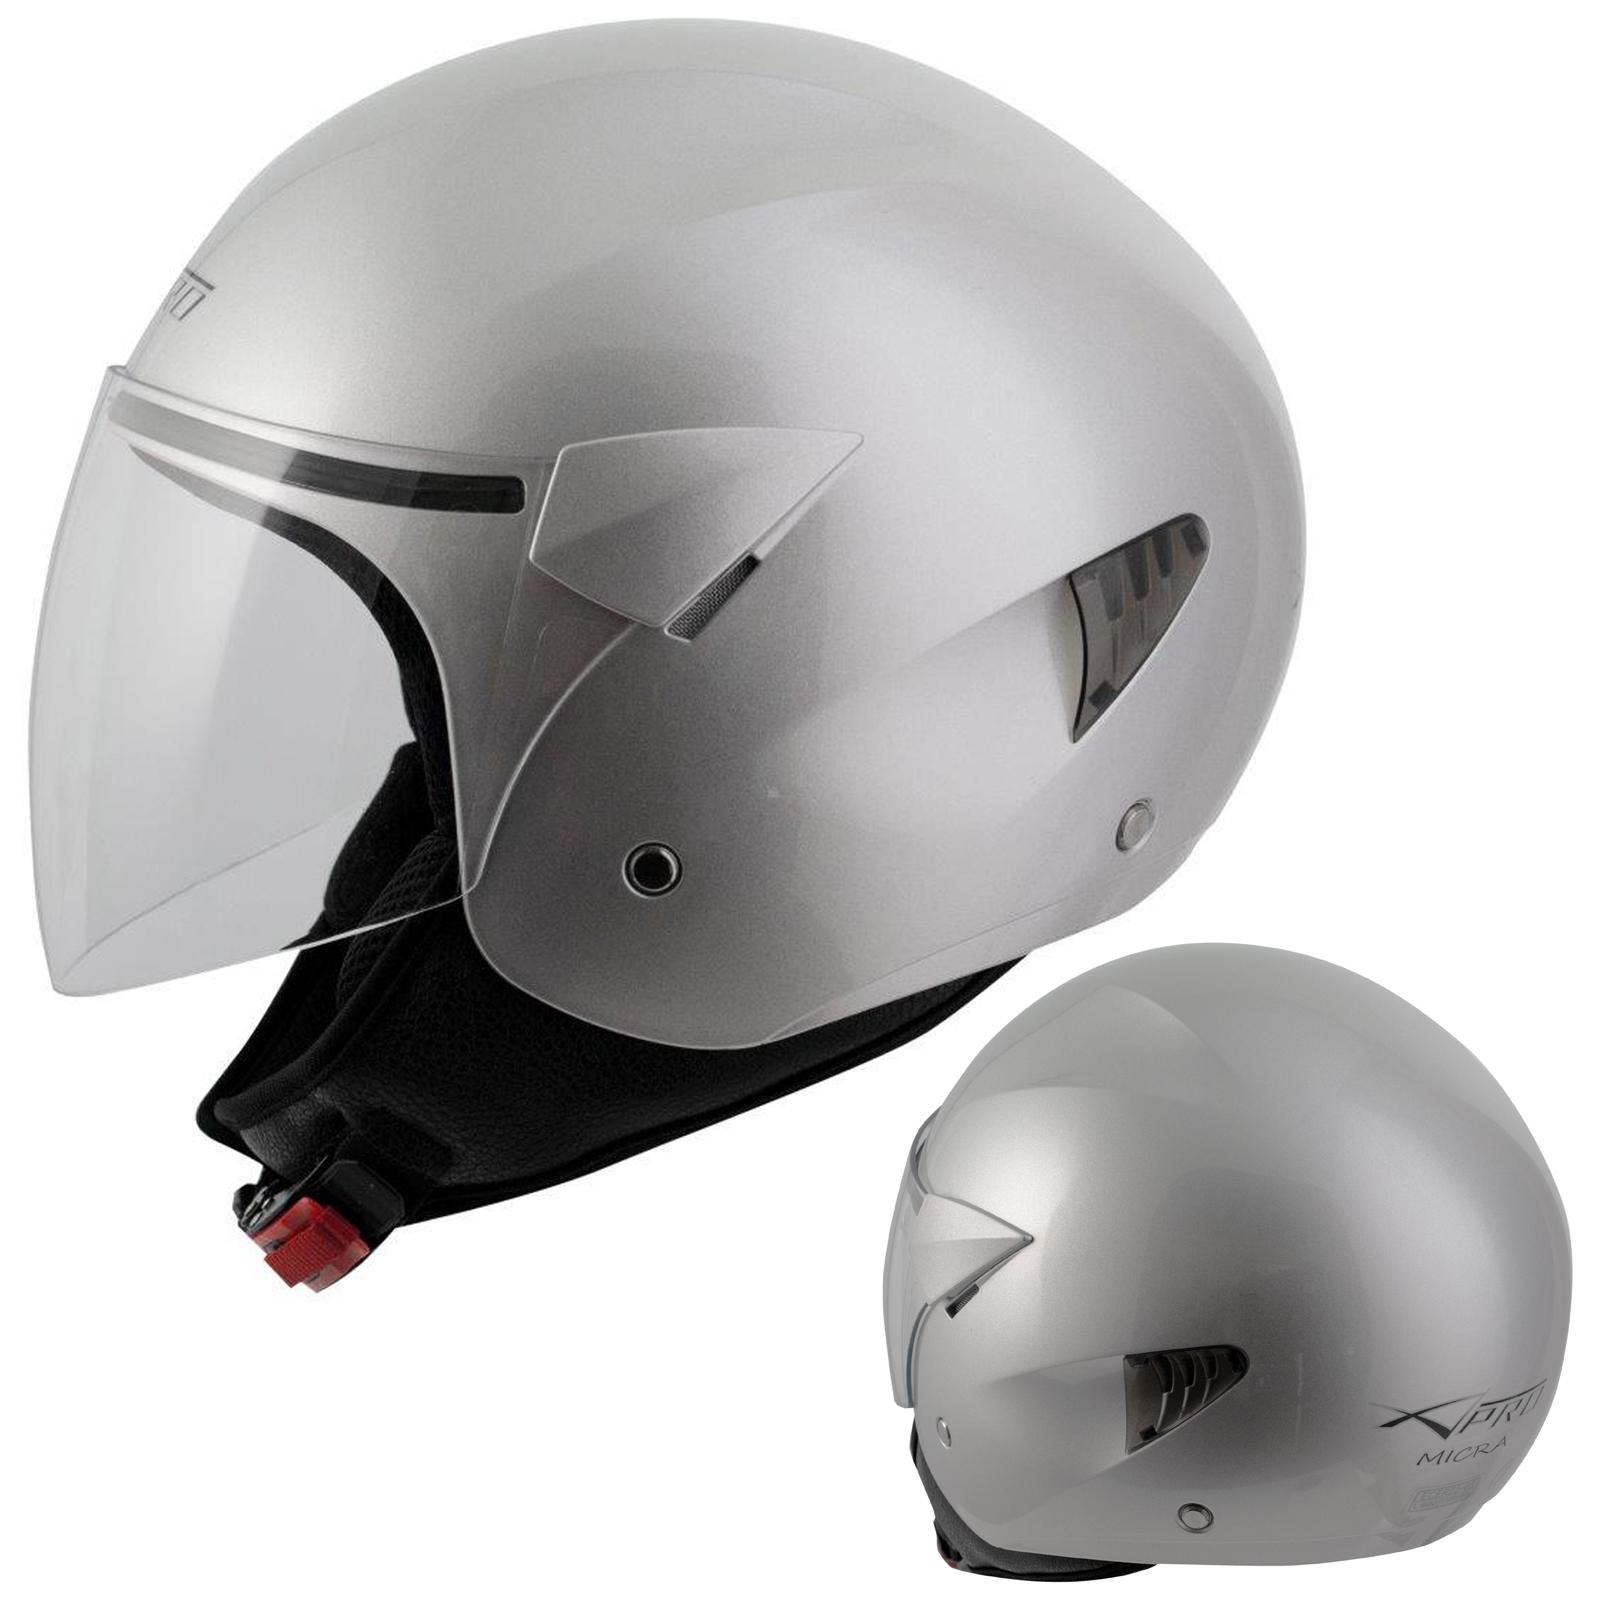 b1cfa0d3be1be Detalles de Demi Jet Casco Moto Scooter Homologado ECE 22-05 Visor Pantalla  Plata